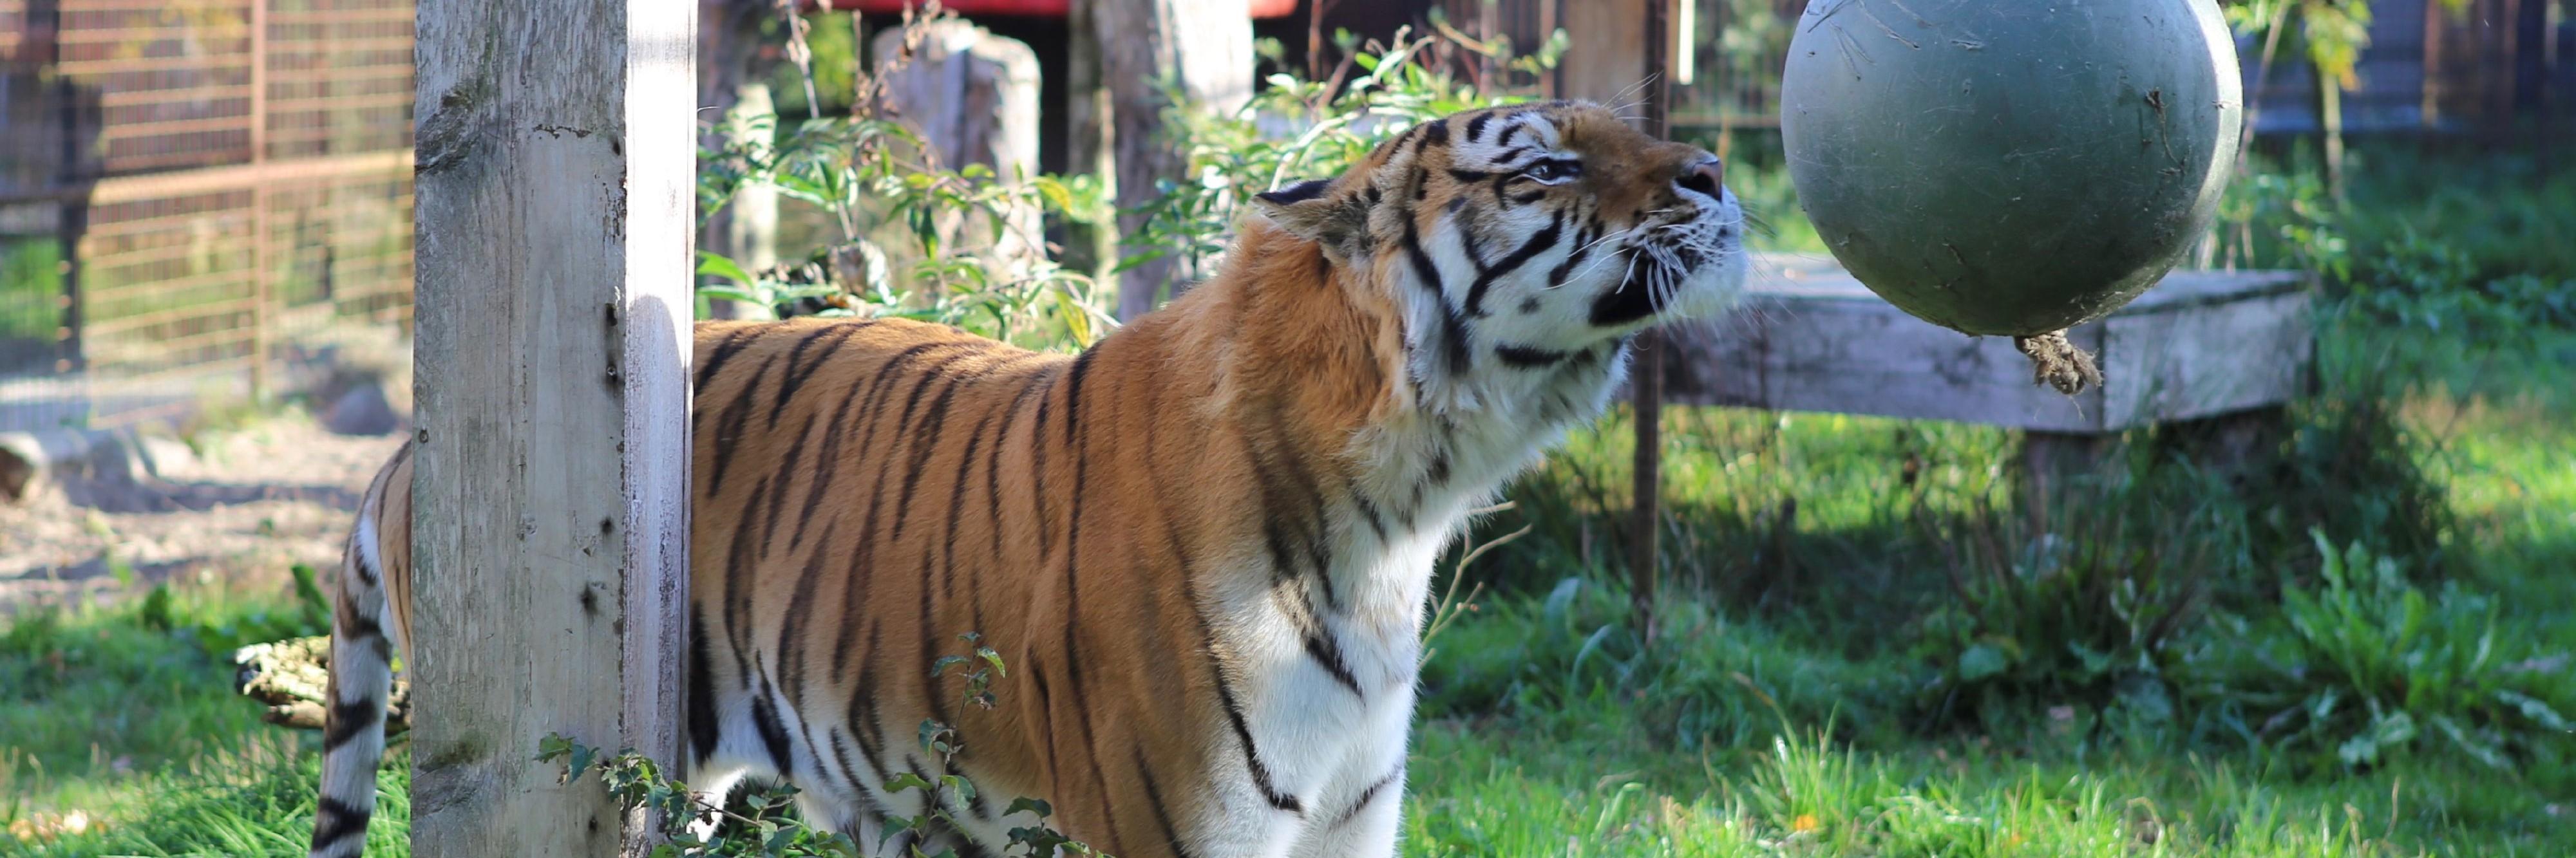 Tiger Caruso with enrichment